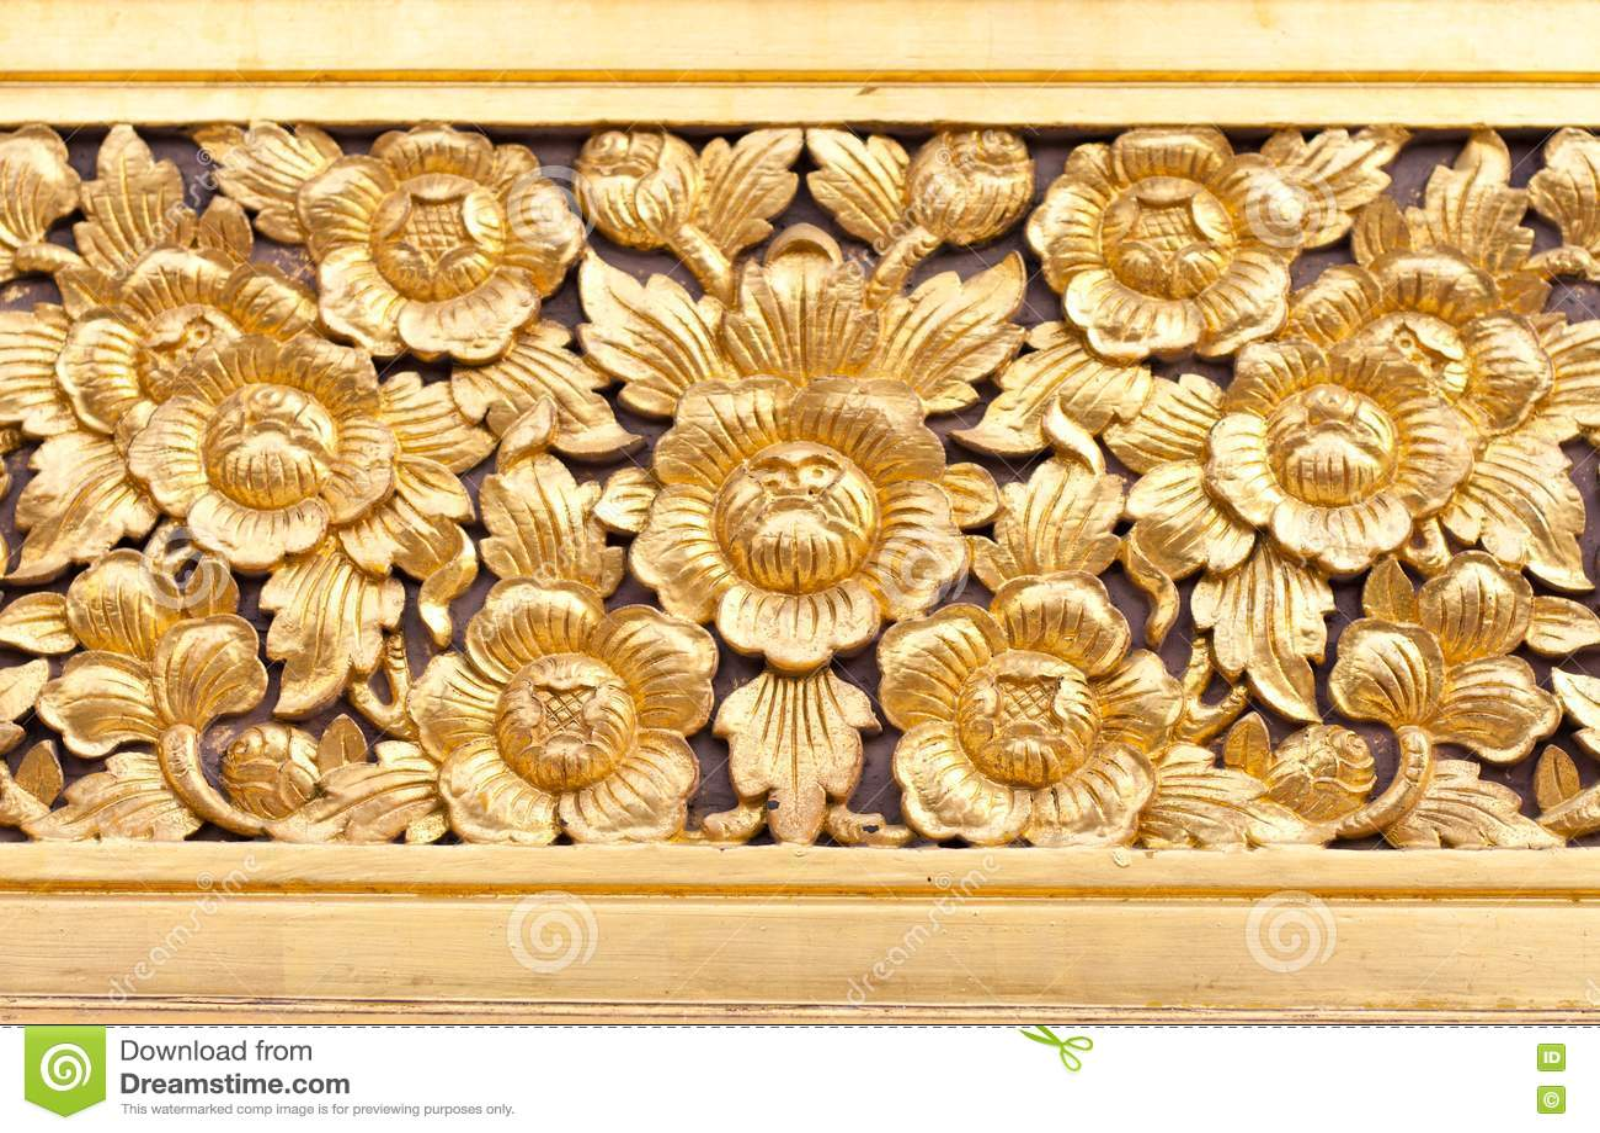 kunst schnitzen auf holz stockfoto bild 13996440. Black Bedroom Furniture Sets. Home Design Ideas